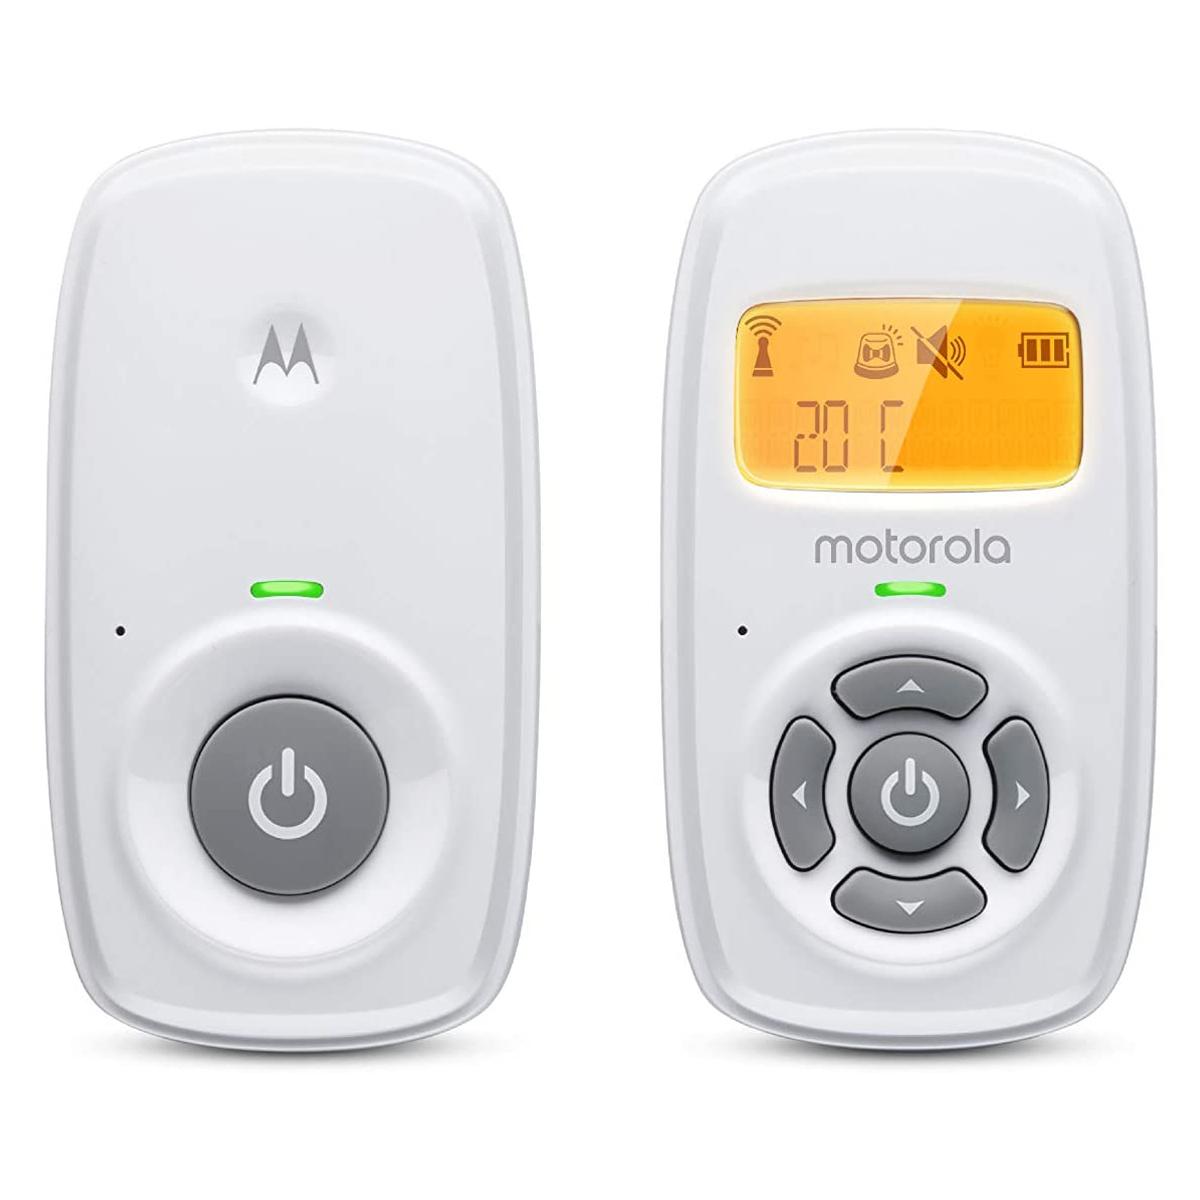 Écoute bébé Babyphone MBP24 Babyphone MBP24